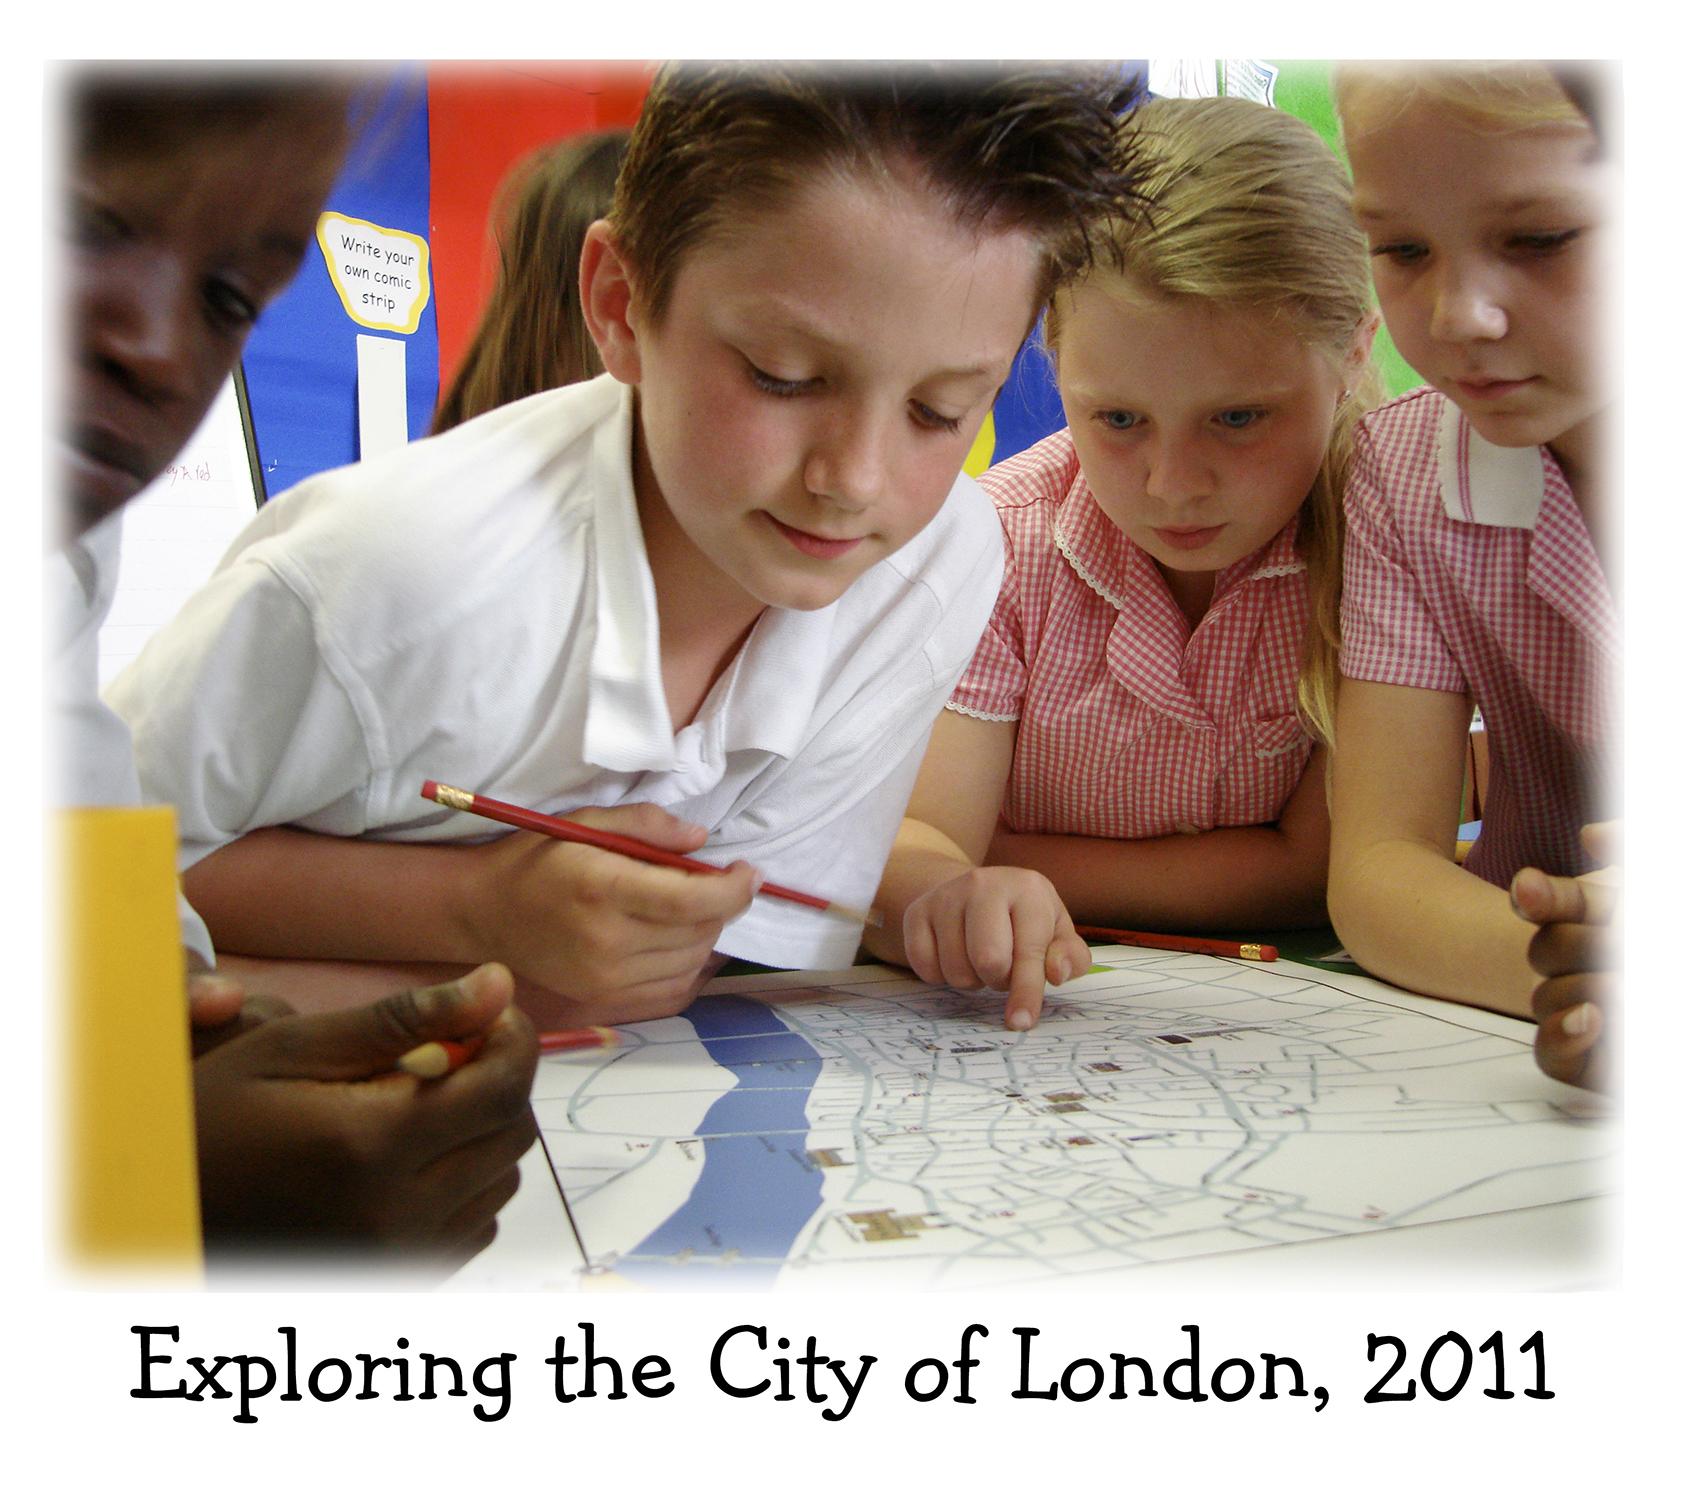 Four children examine a map in a Guy Fox workshop